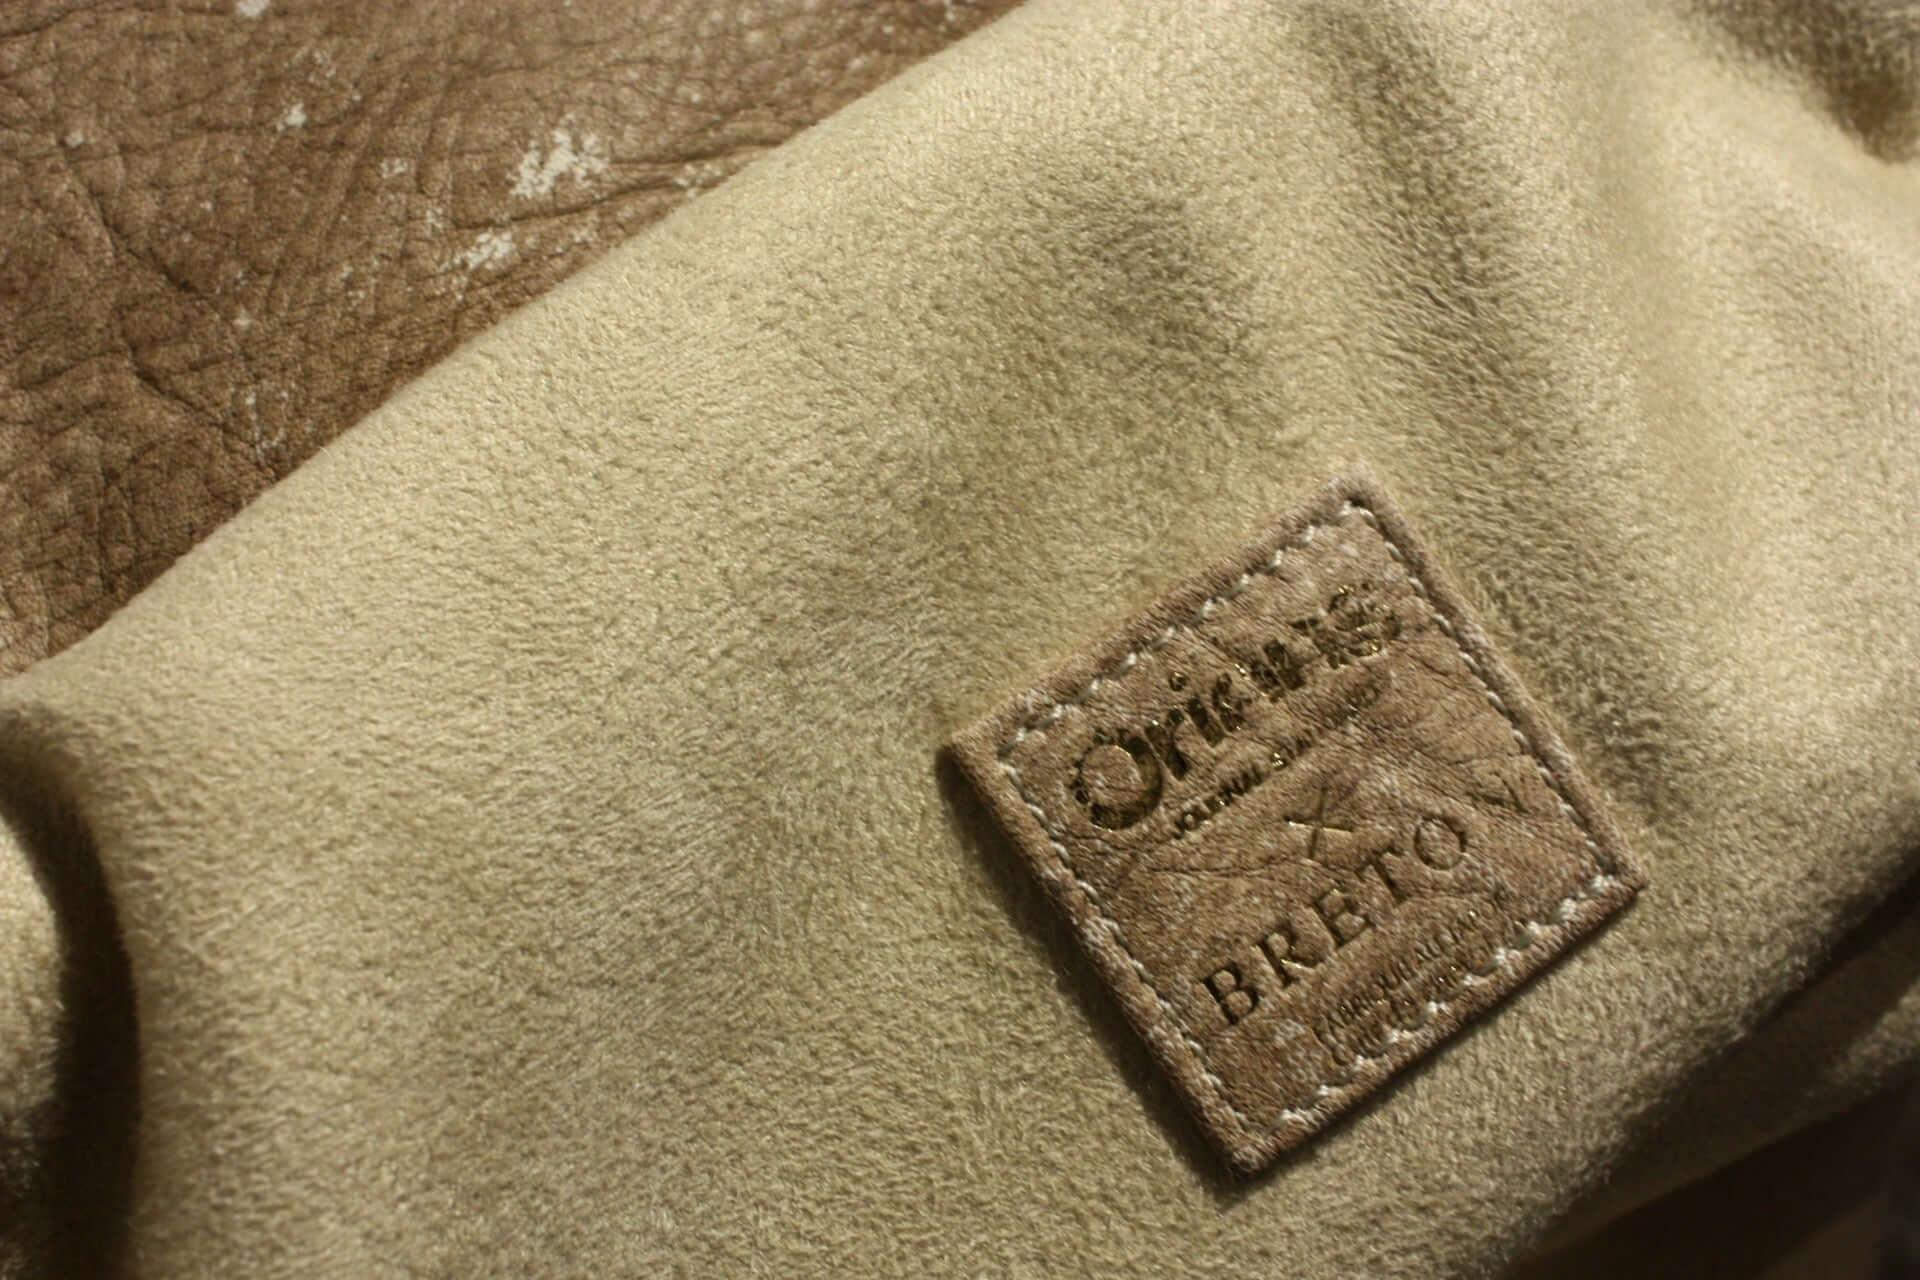 Oriens JOURNAL STANDARD×BRETONの別注バッグが発売決定|アルゼンチン産馬革を使用した唯一無二のデザイン life200608_oriens_journalstandard_5-1920x1280